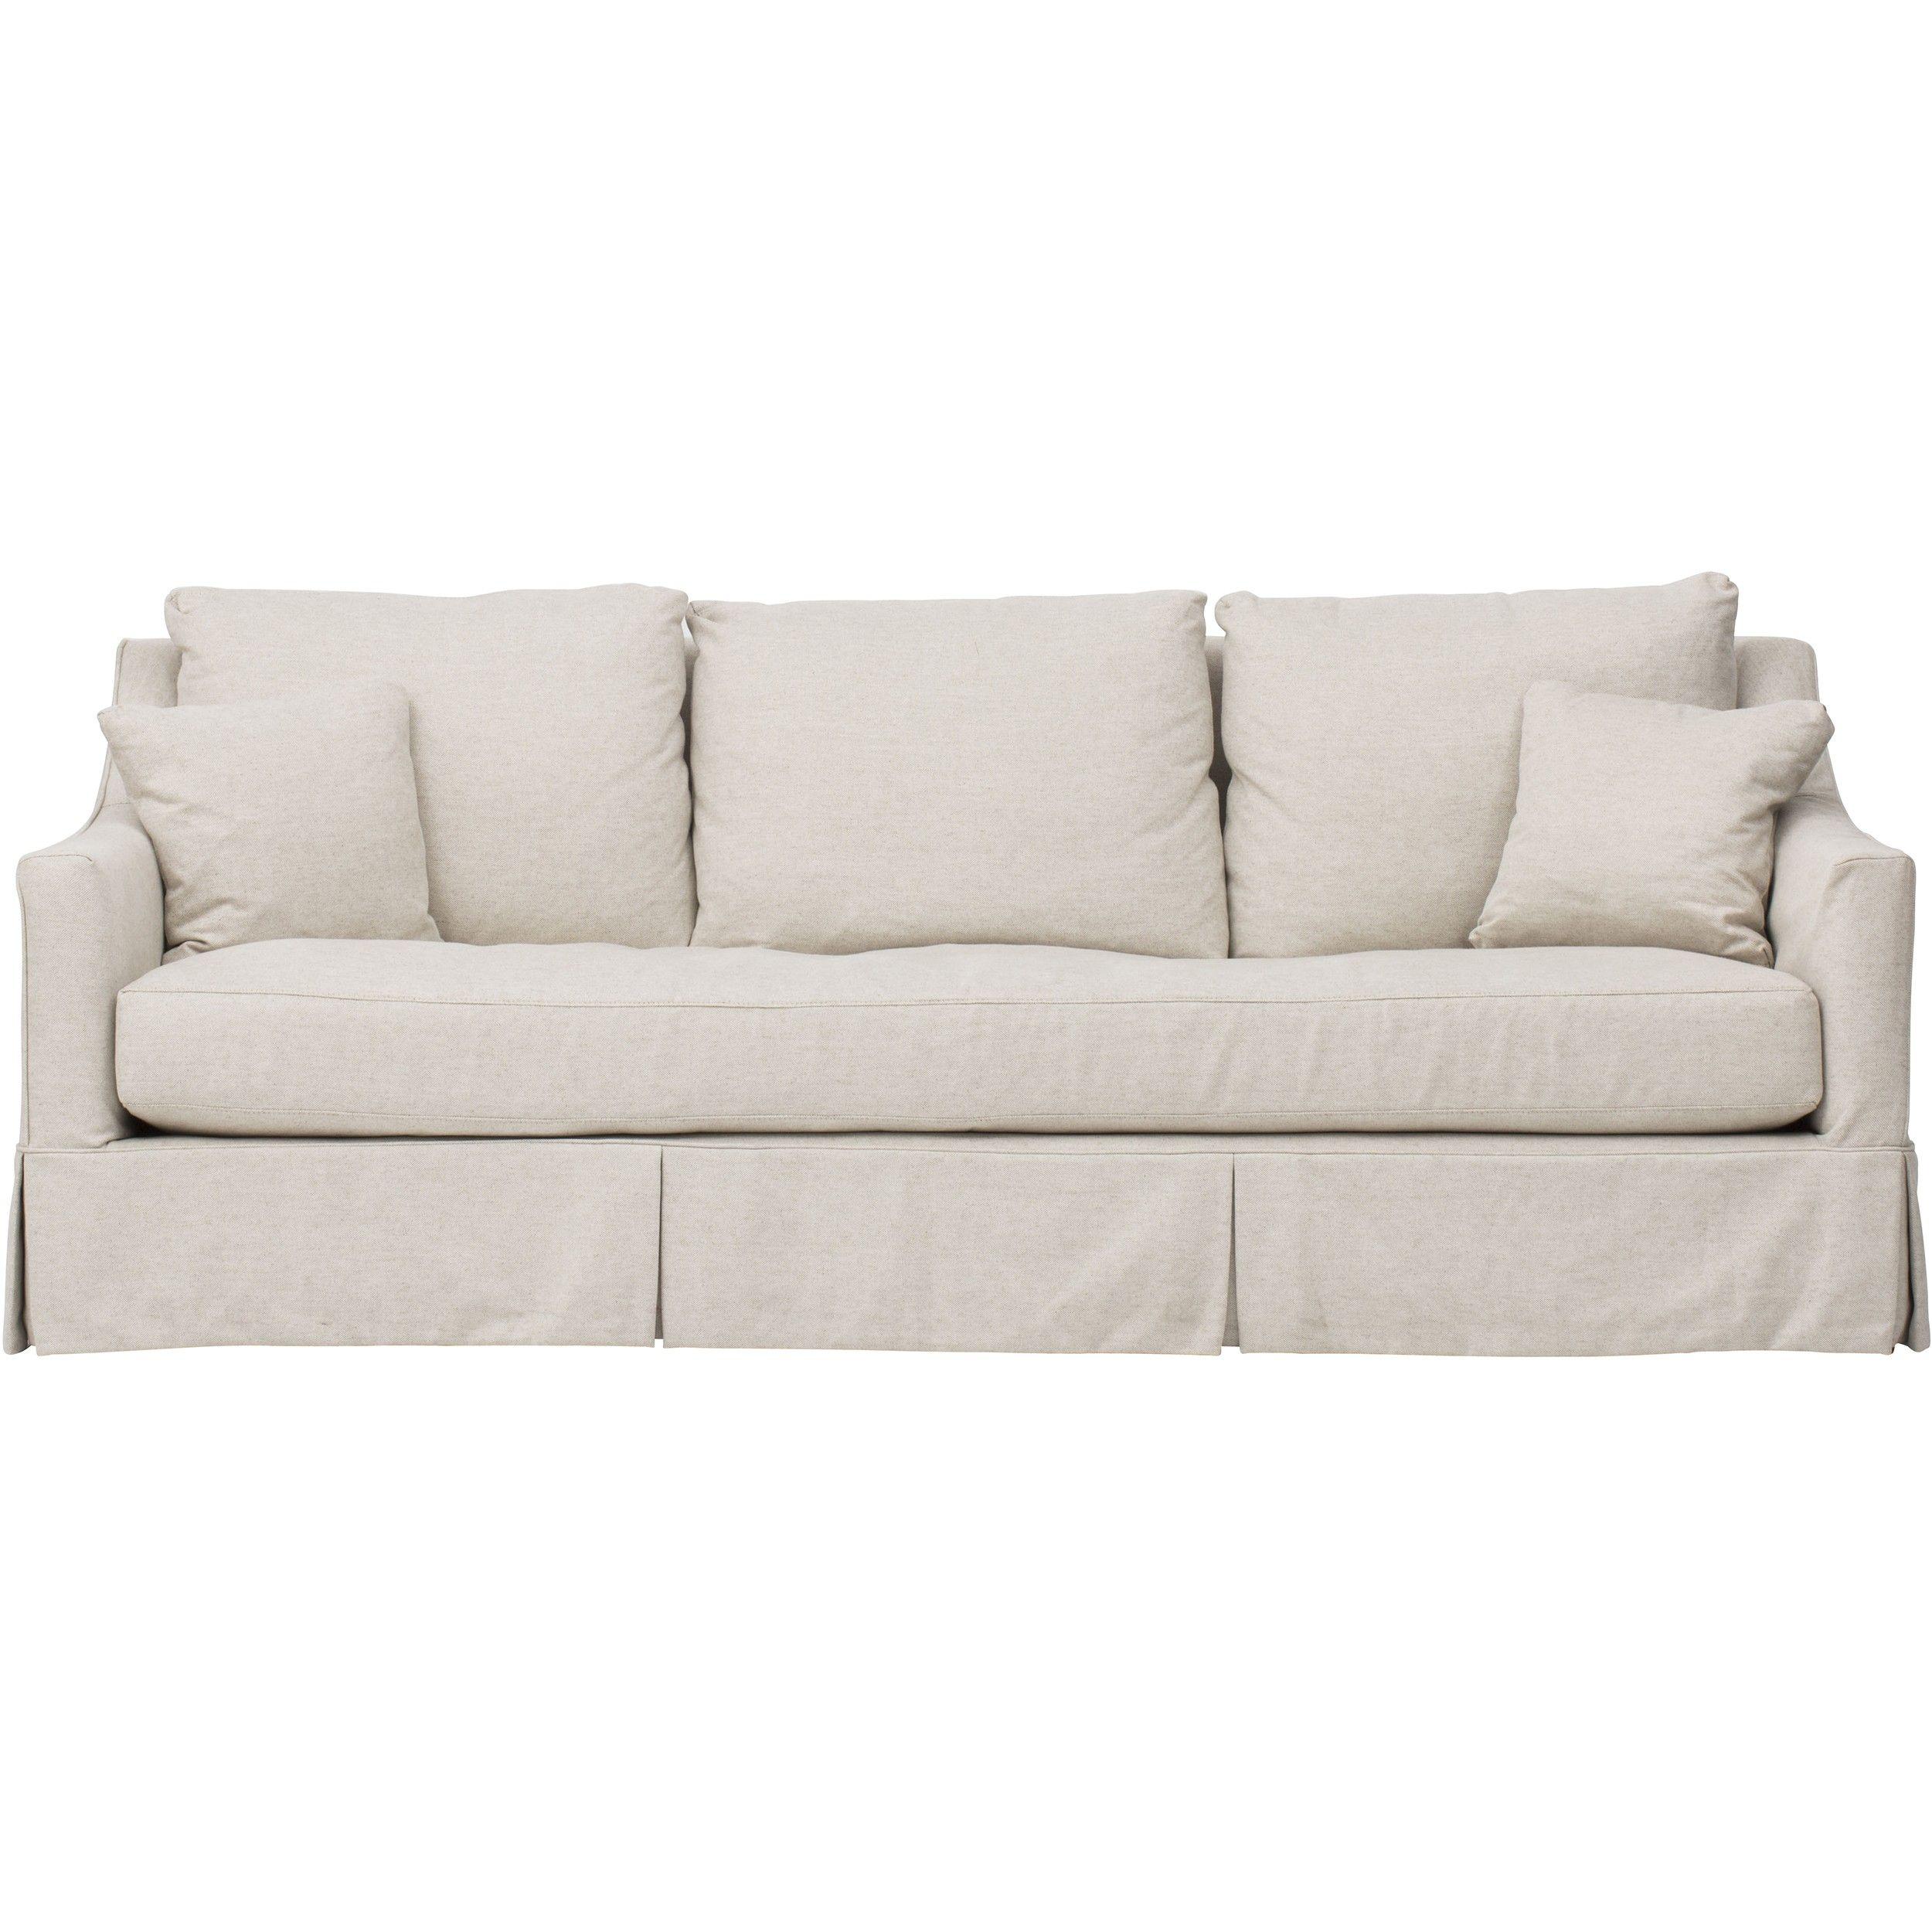 Lily Slipcover Sofa, Duet Natural | florida | Sofa furniture ...